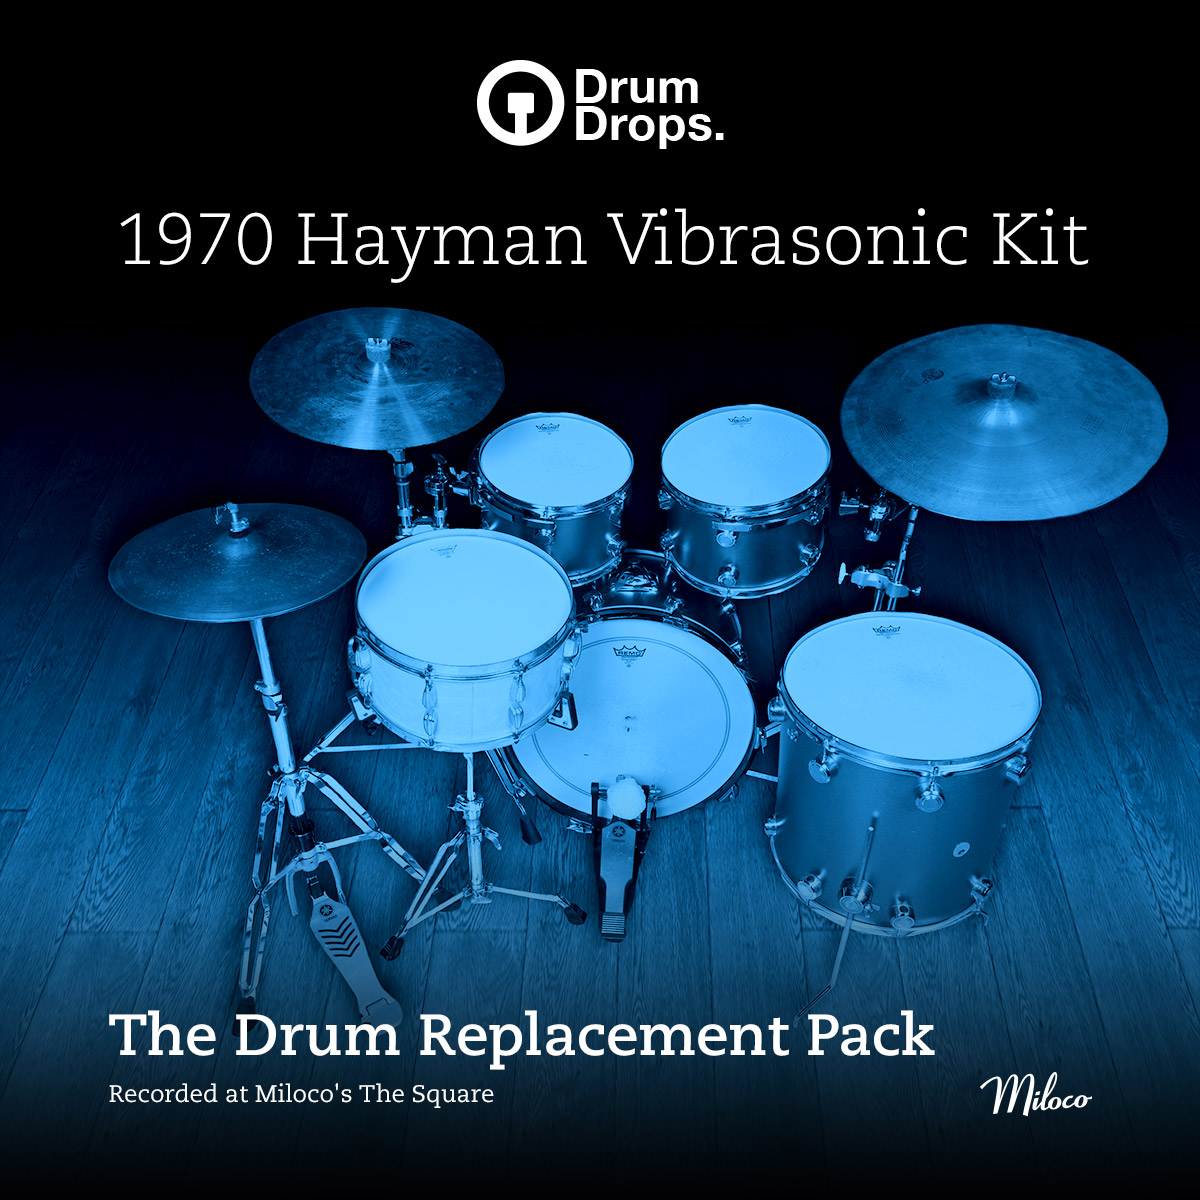 1970s Hayman Vibrasonic kit - Drum Replacement Pack